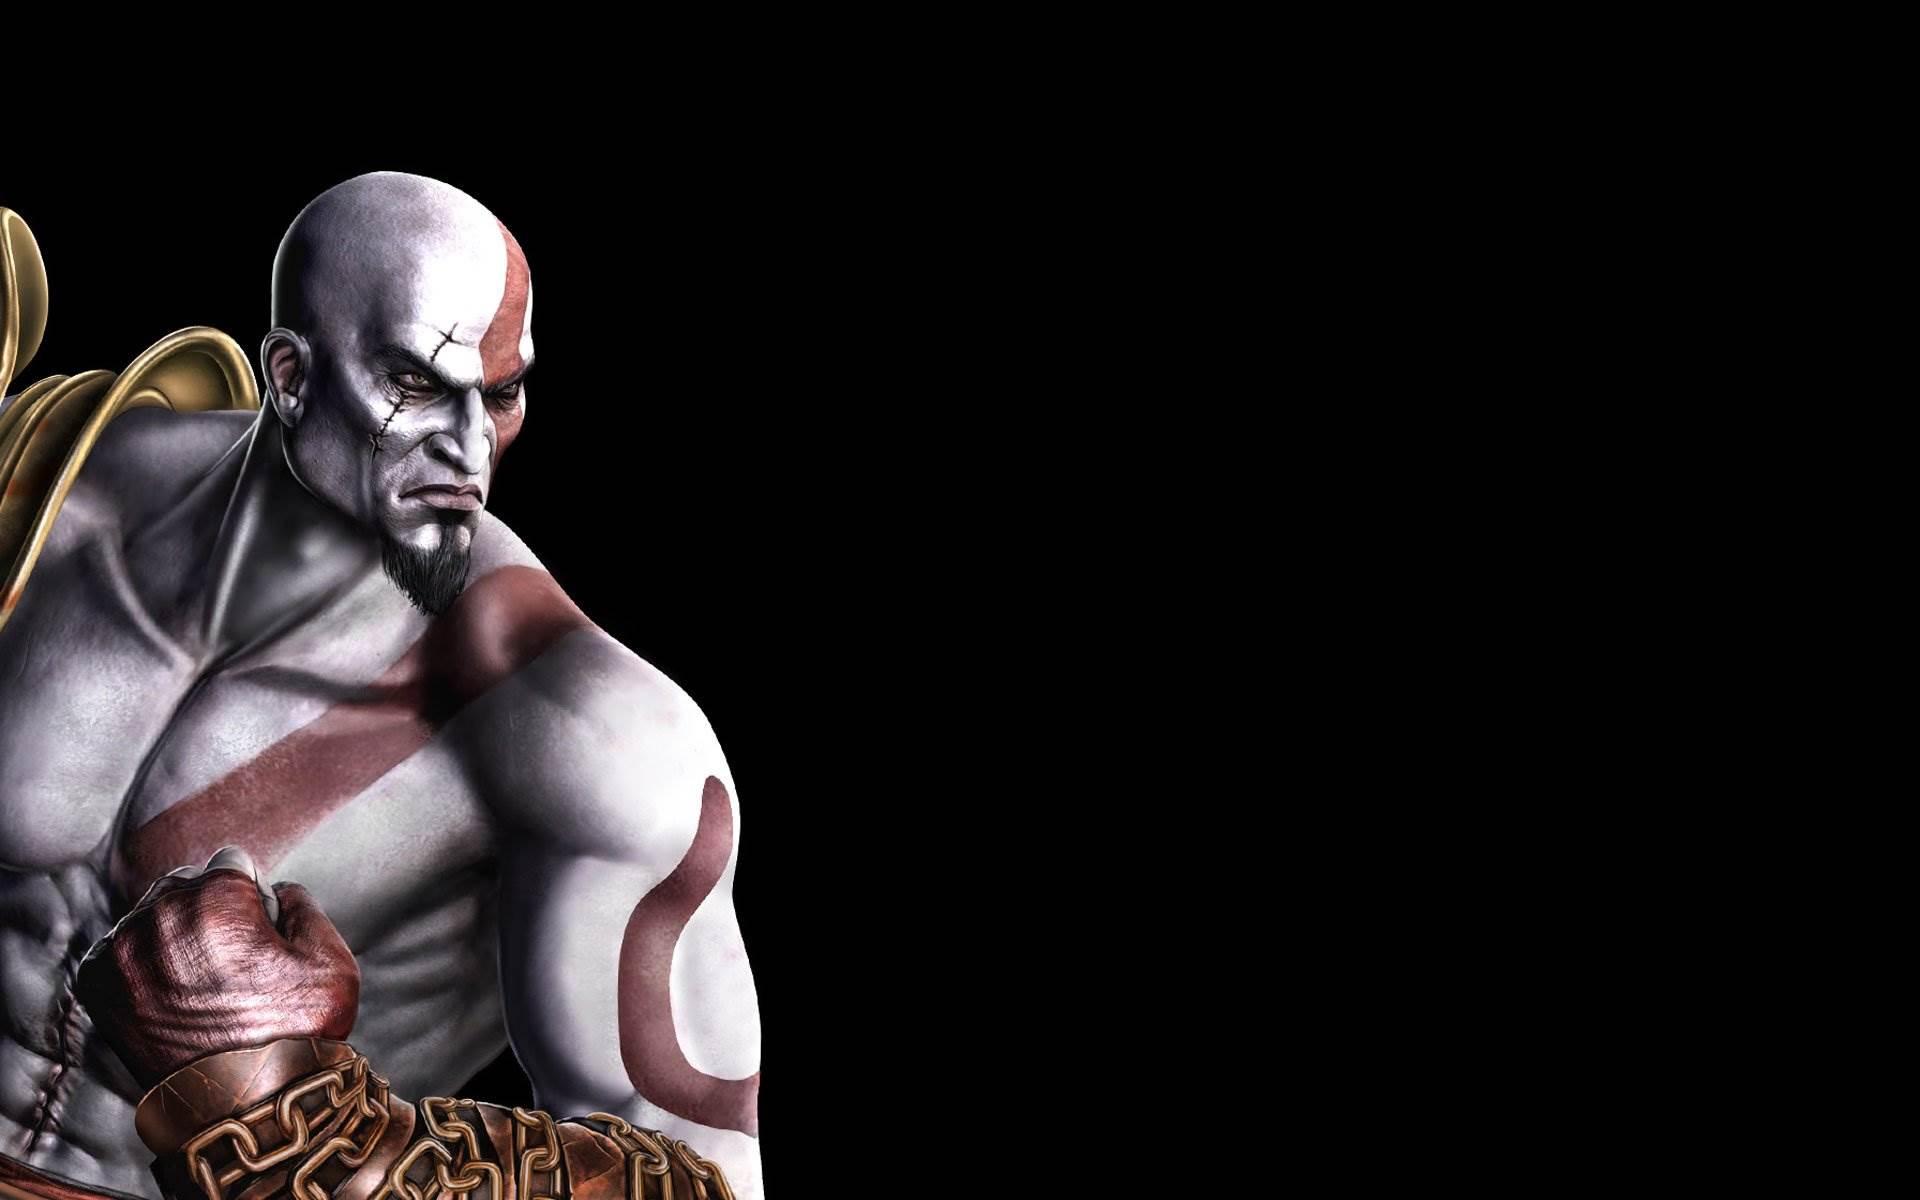 Mortal Kombat, Scorpion , Kratos, God Of War Wallpapers 1920x1200